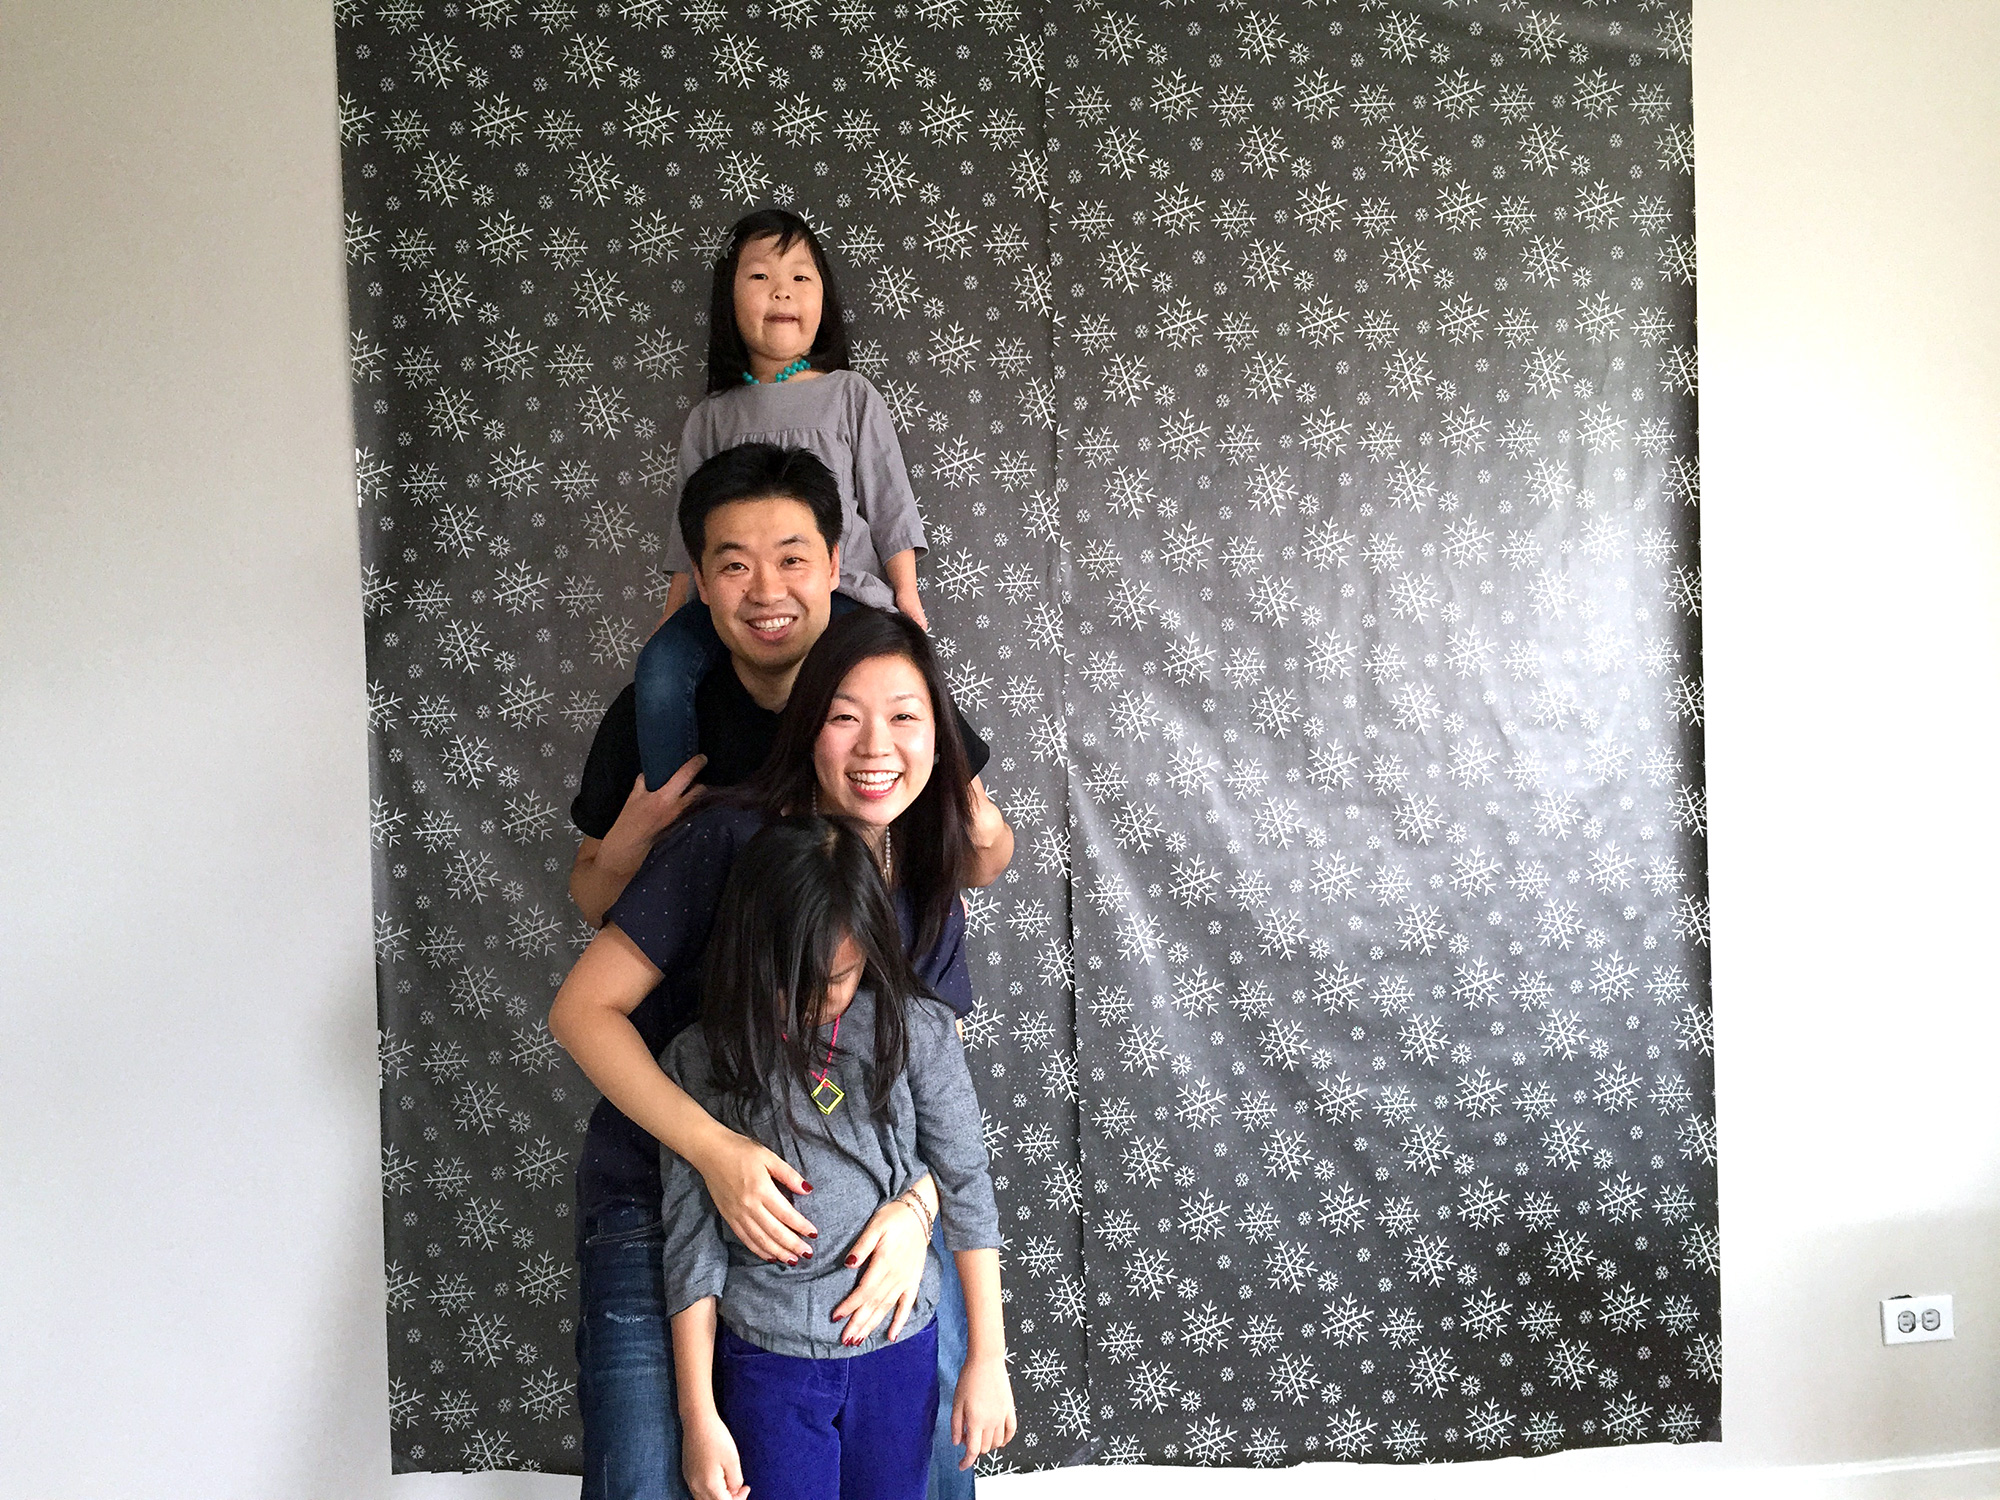 xmasfamilyphoto2014-2